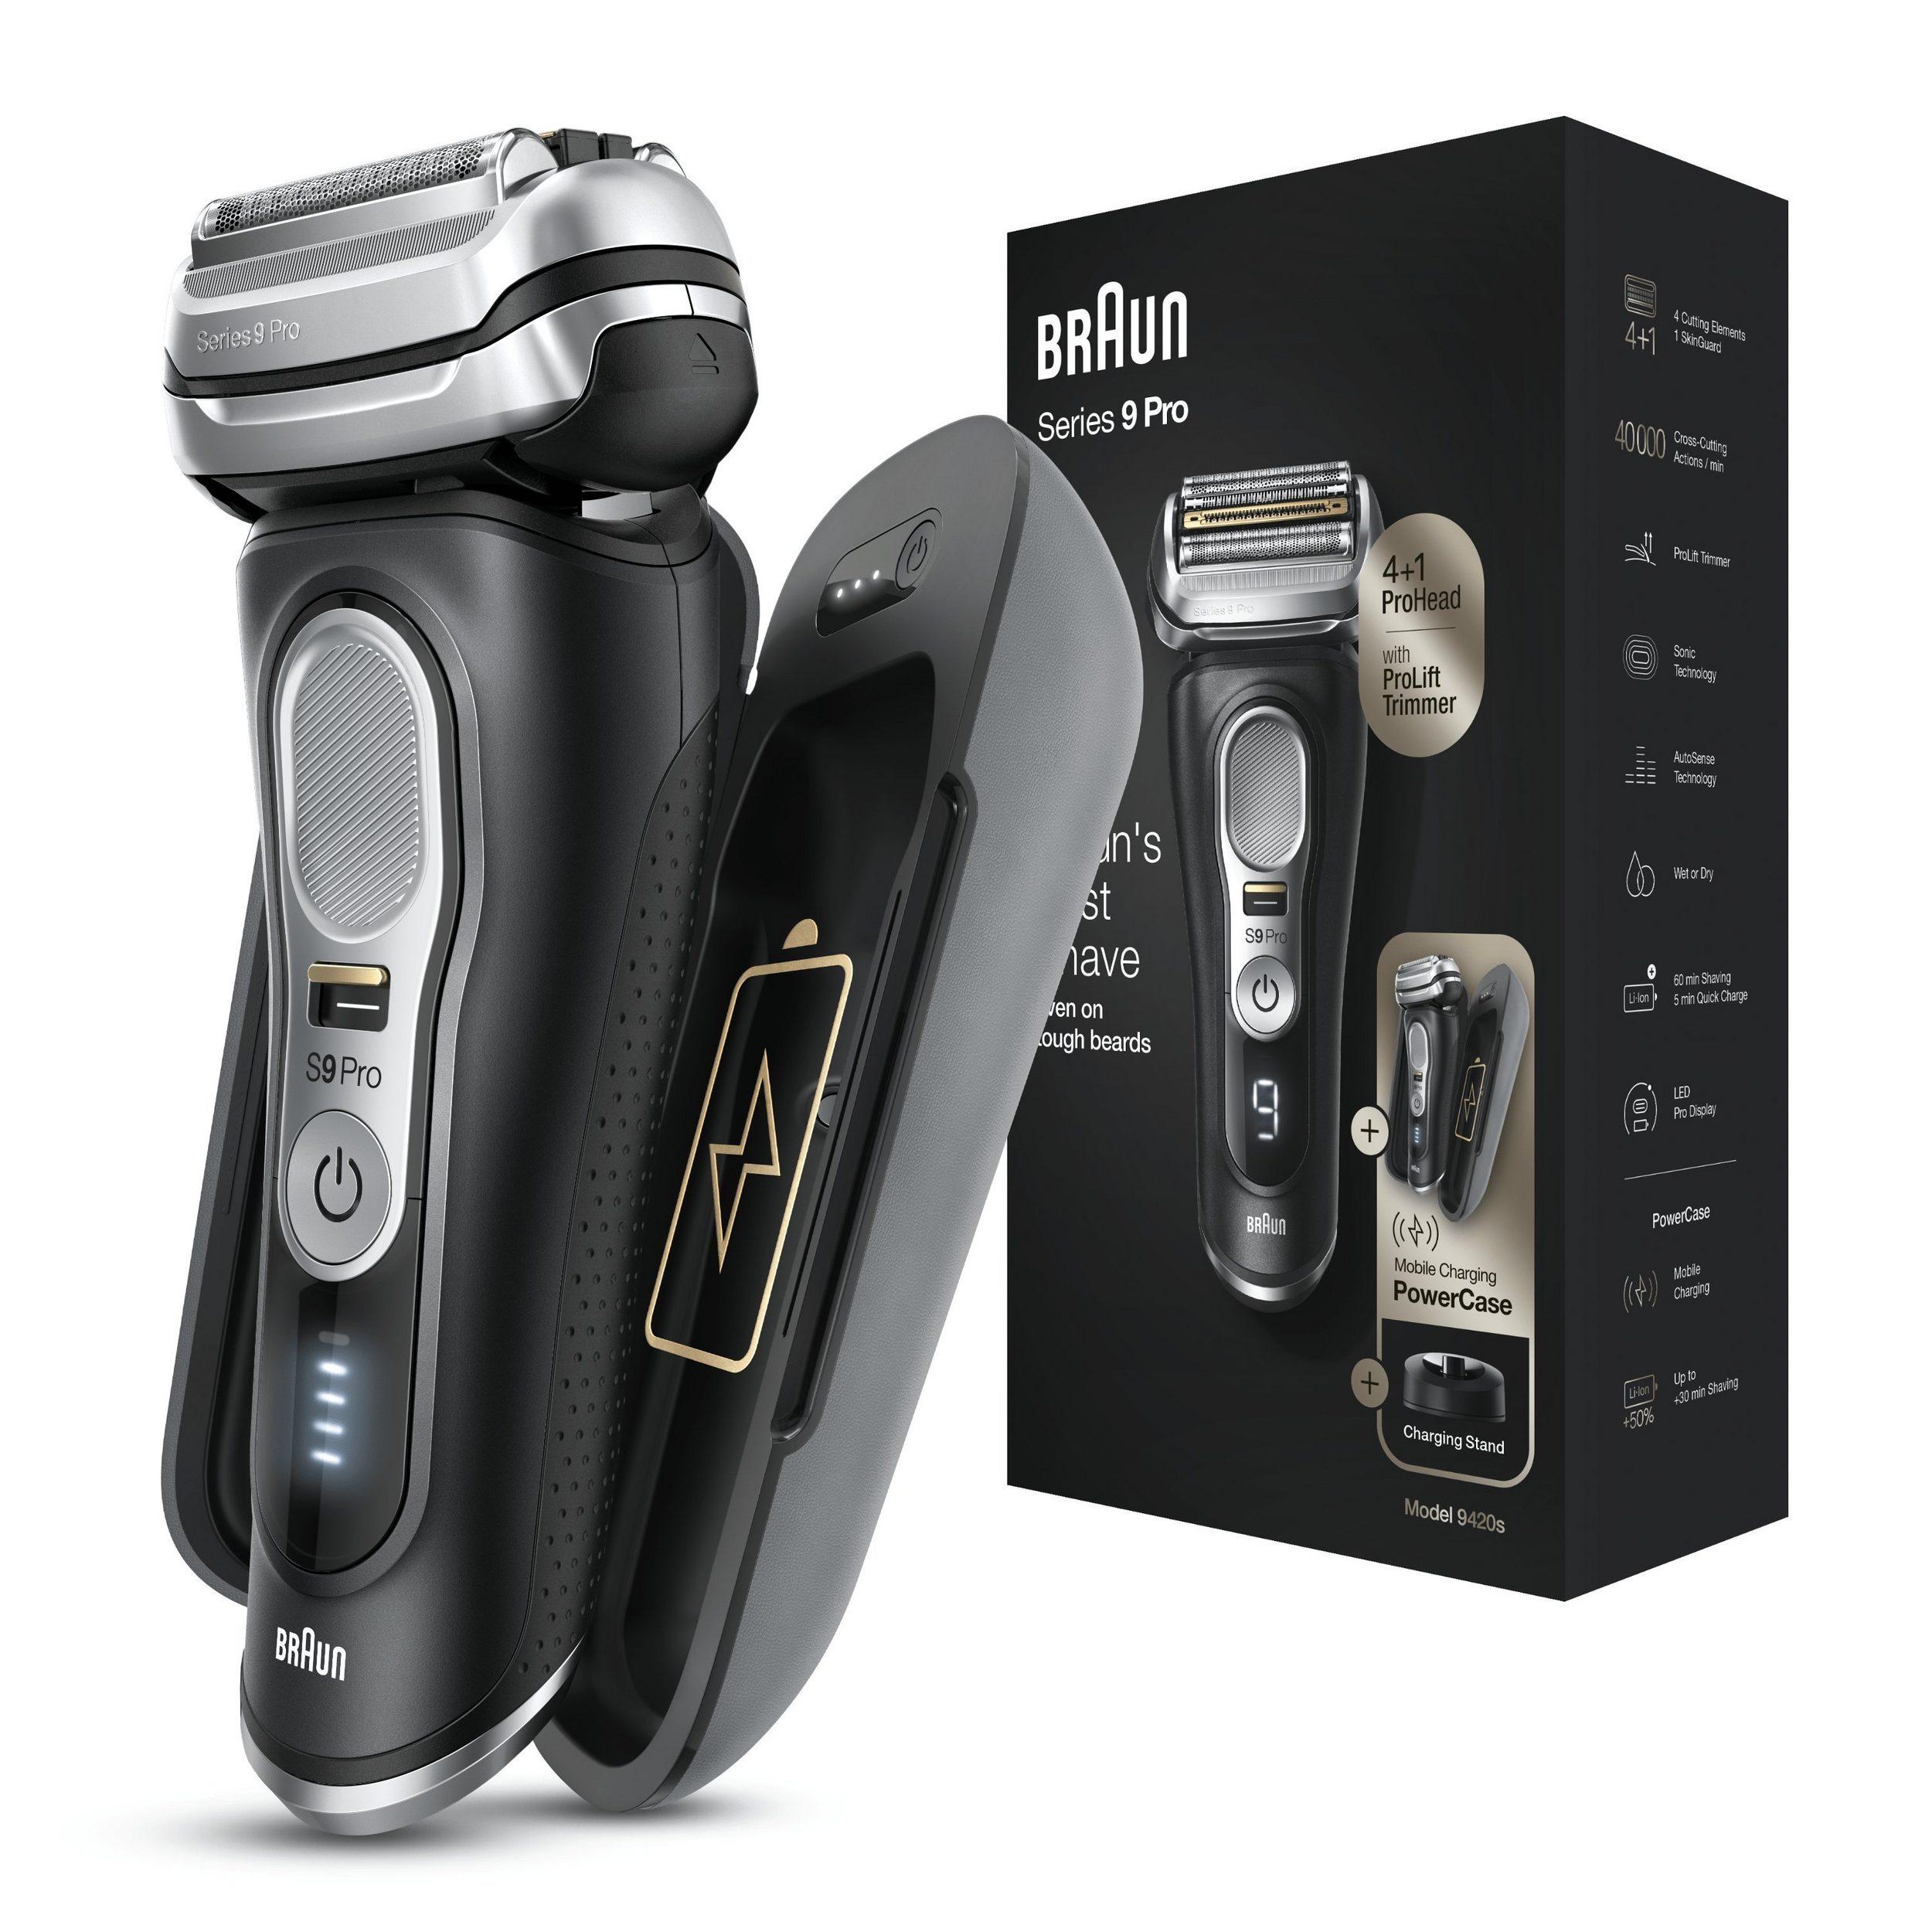 Braun Series 9 Pro 9420s Wet&Dry